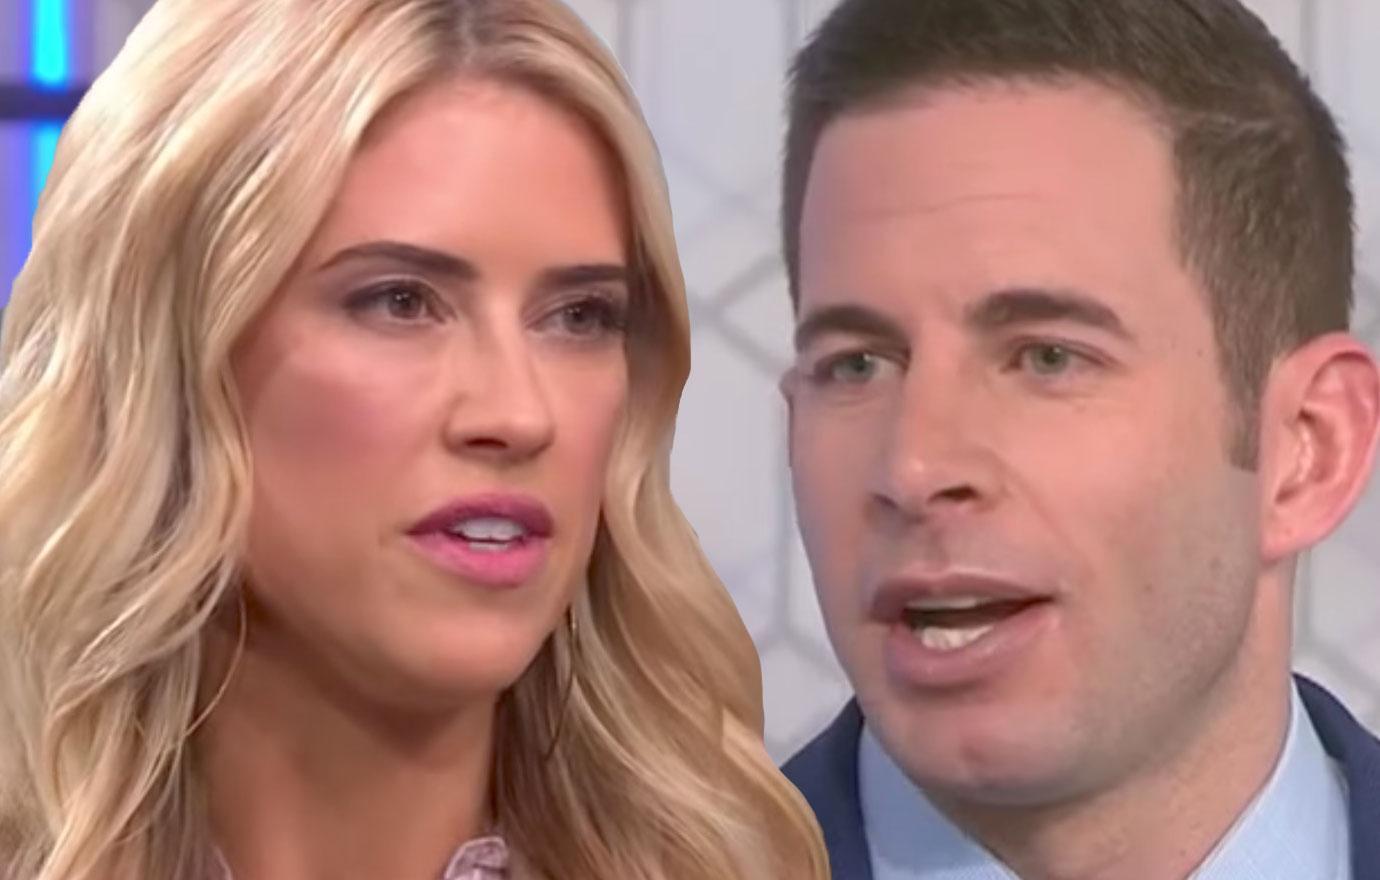 Christina El Moussa Files For Divorce From Tarek El Moussa, Asks Spousal Support